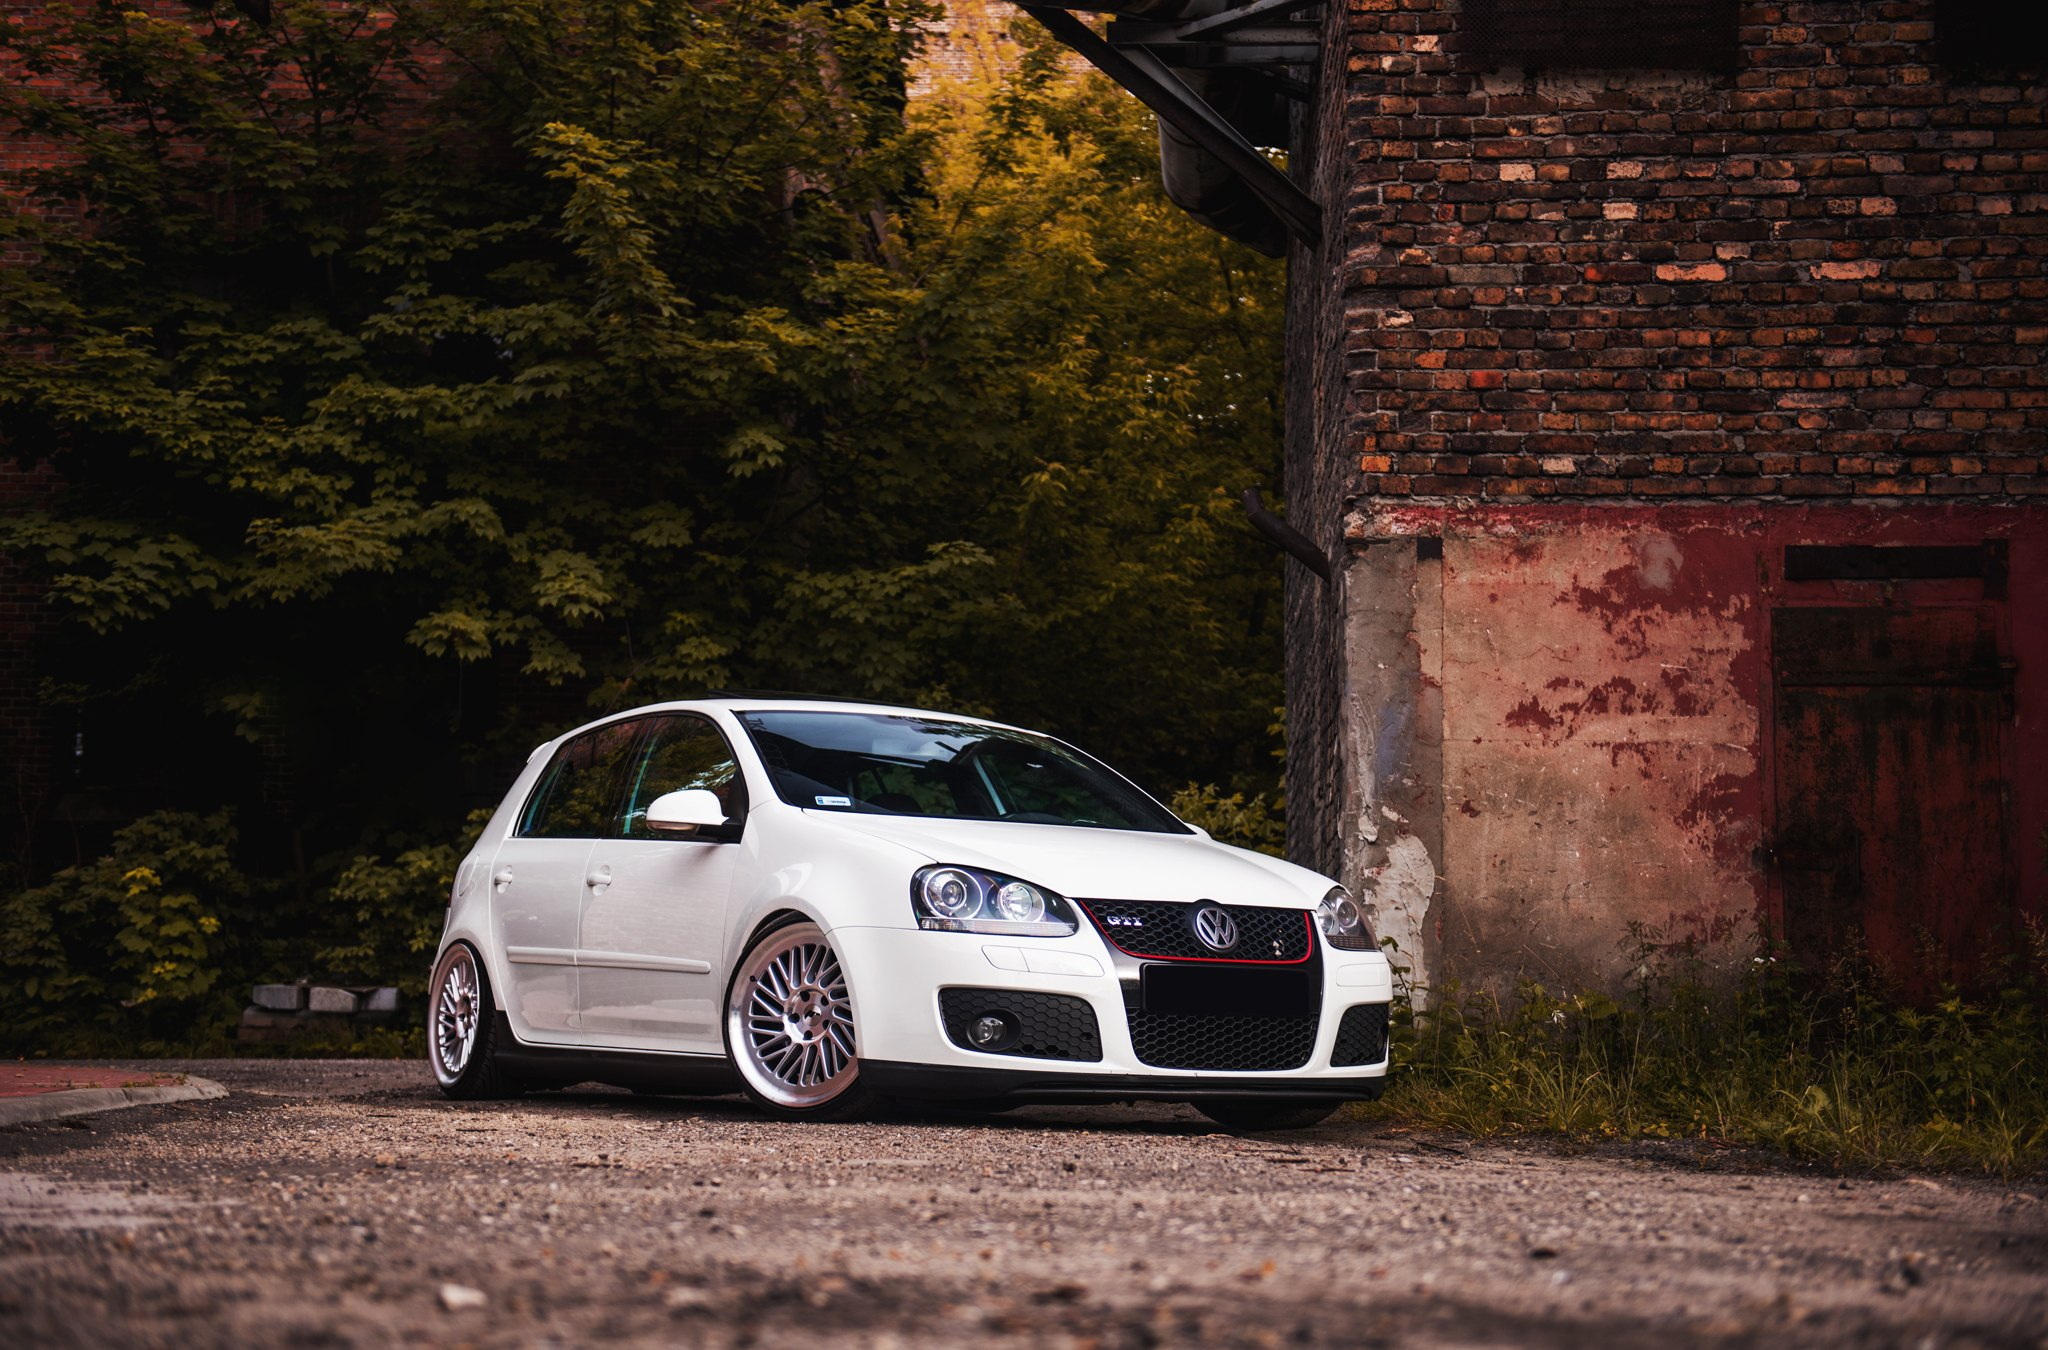 Custom Volkswagen Golf Gti Images Mods Photos Upgrades Carid Com Gallery